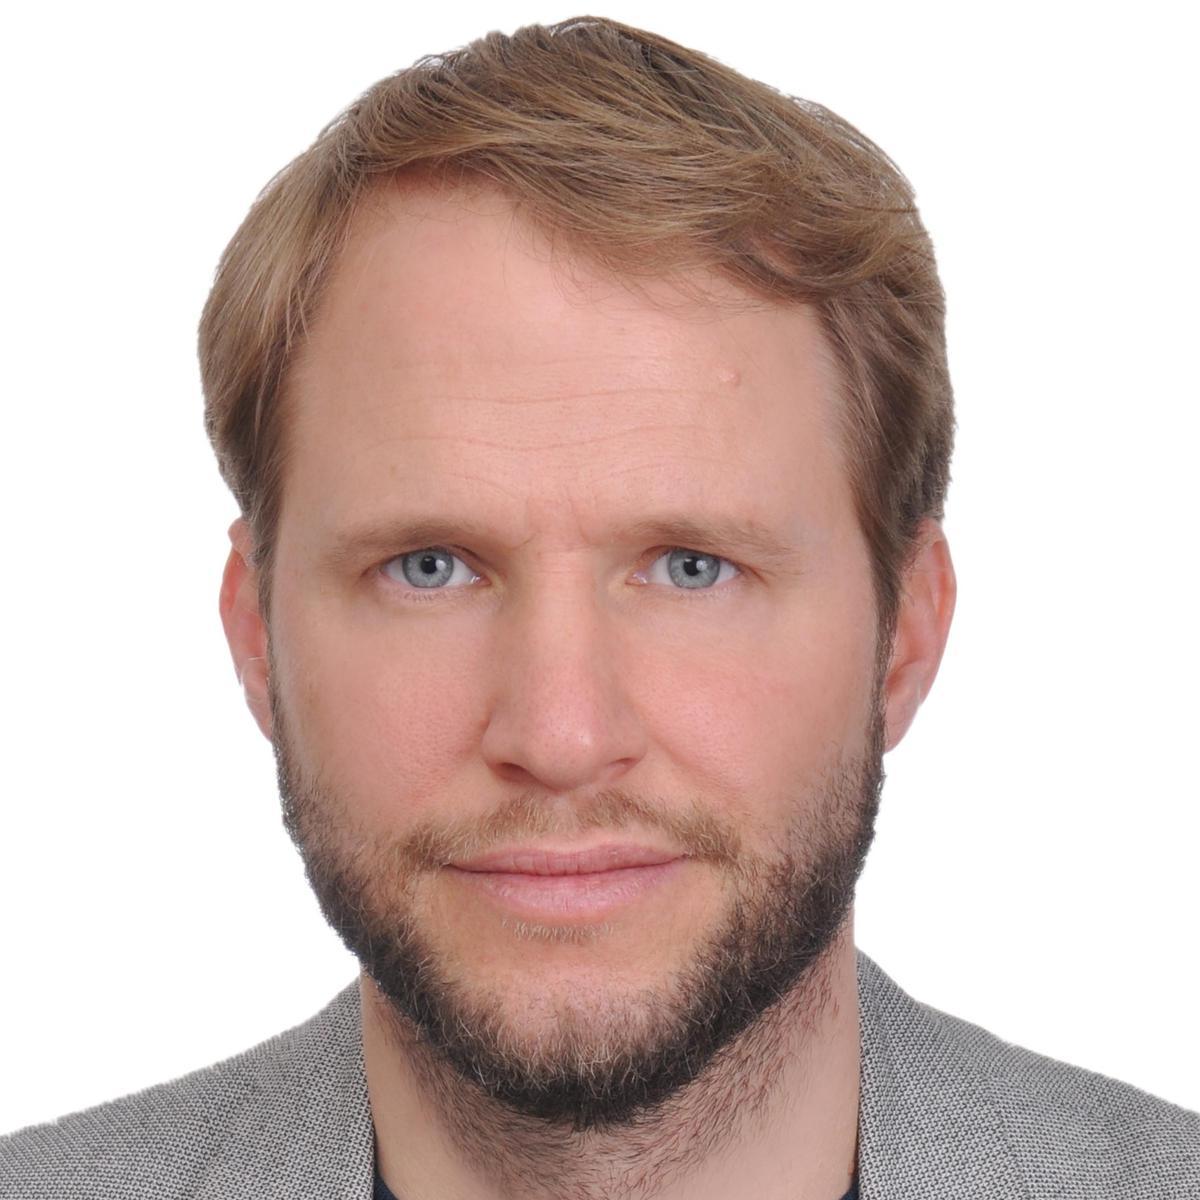 Johannes Reichart